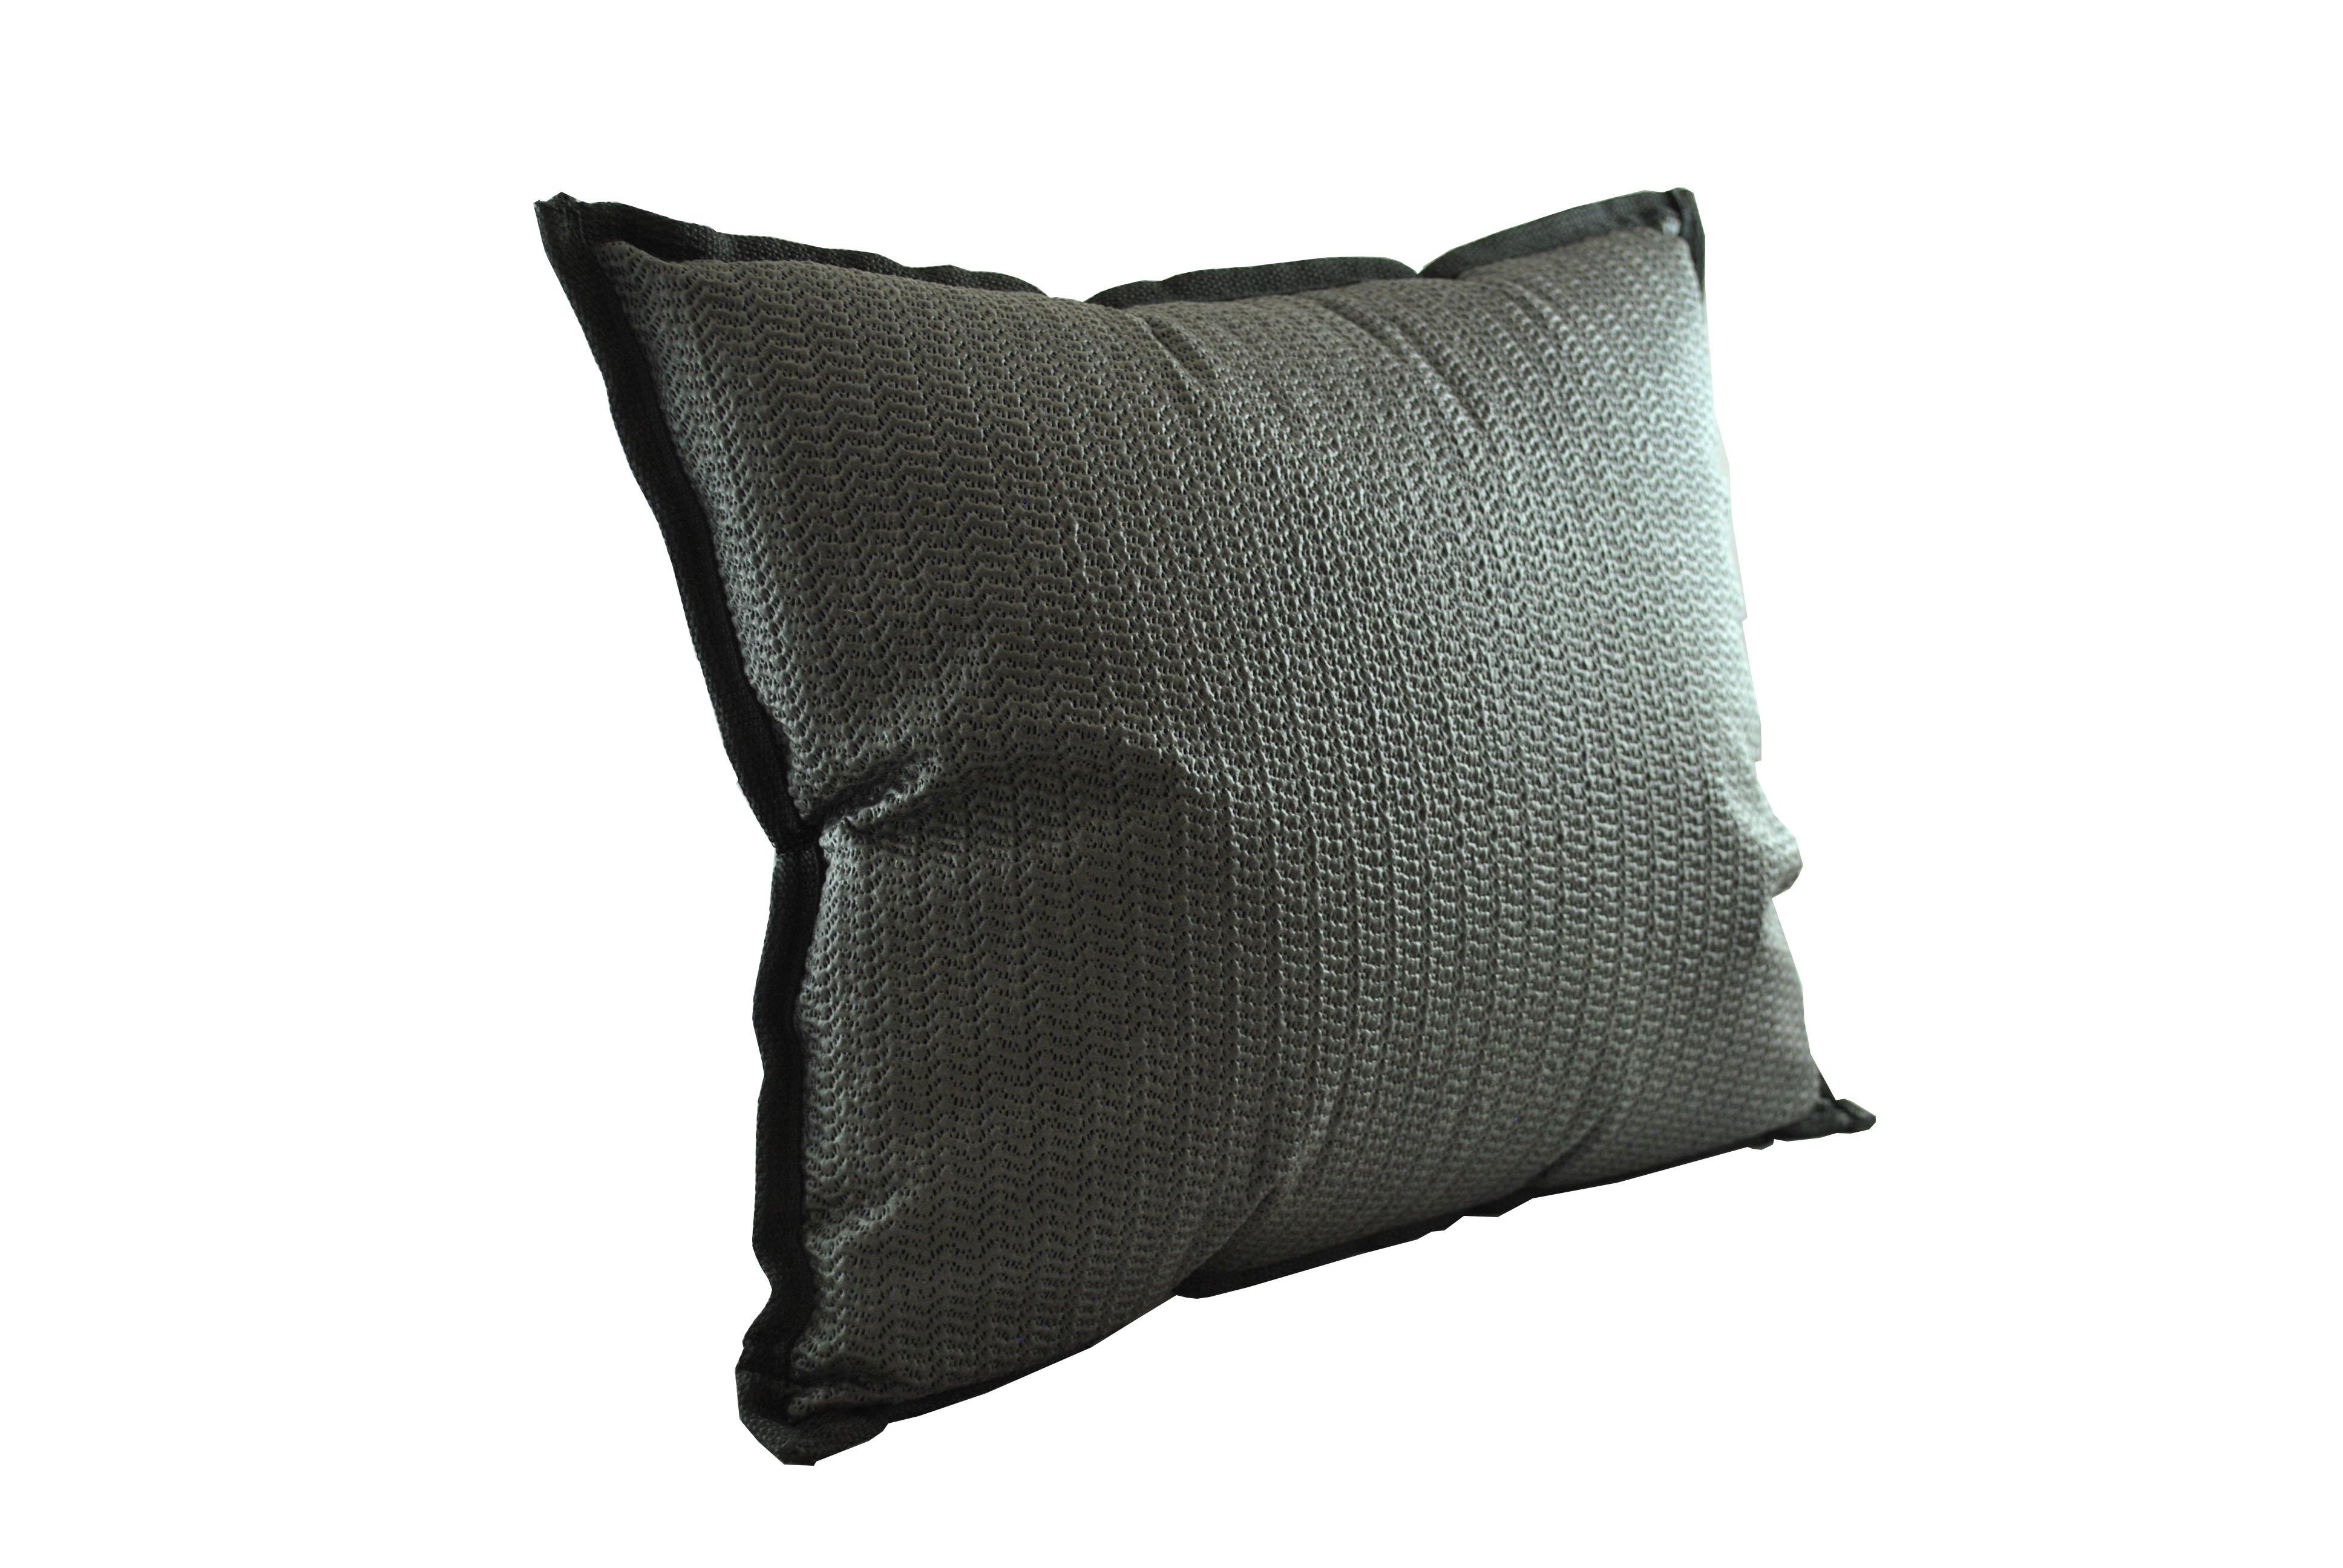 Multi Purpose Sauna Pillow- Black